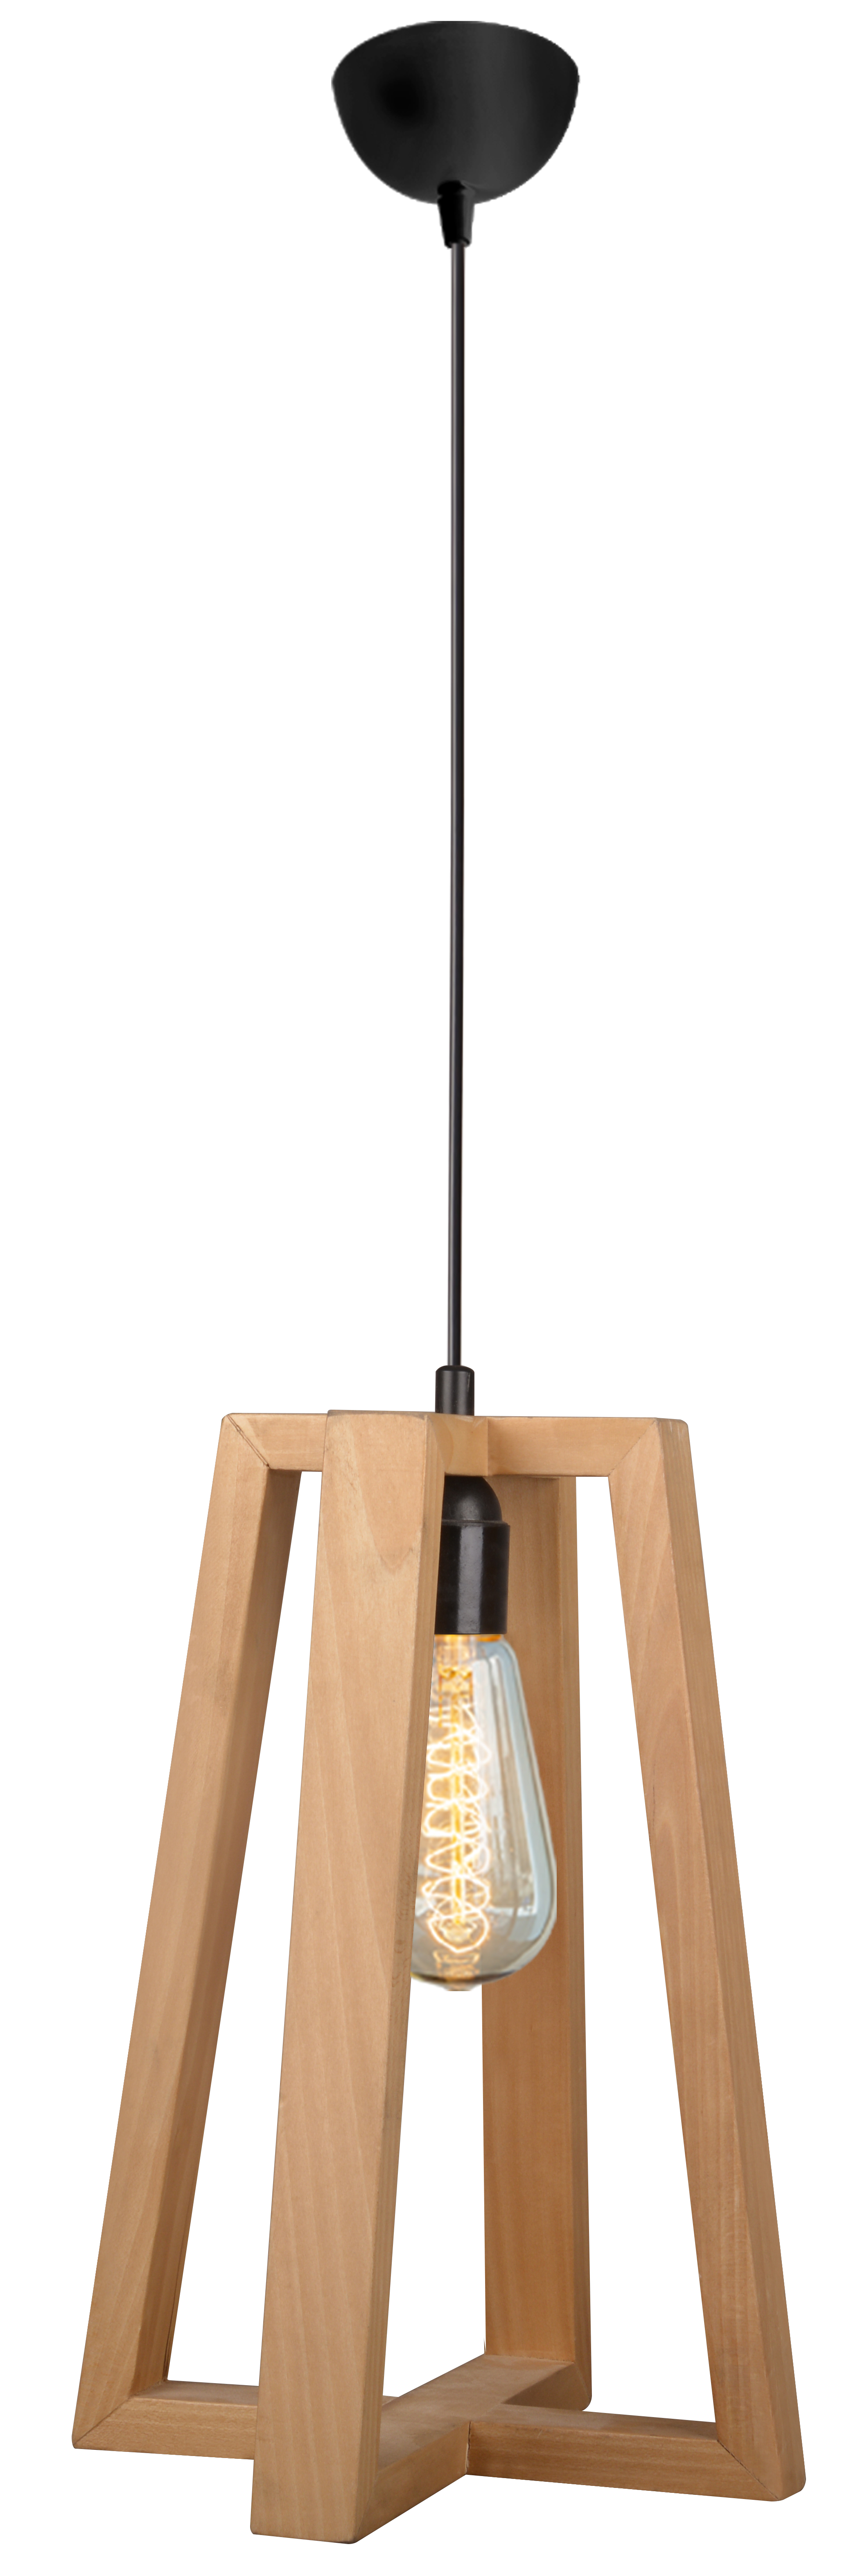 Almila Deckenlampe Origami in eleganter Holzoptik